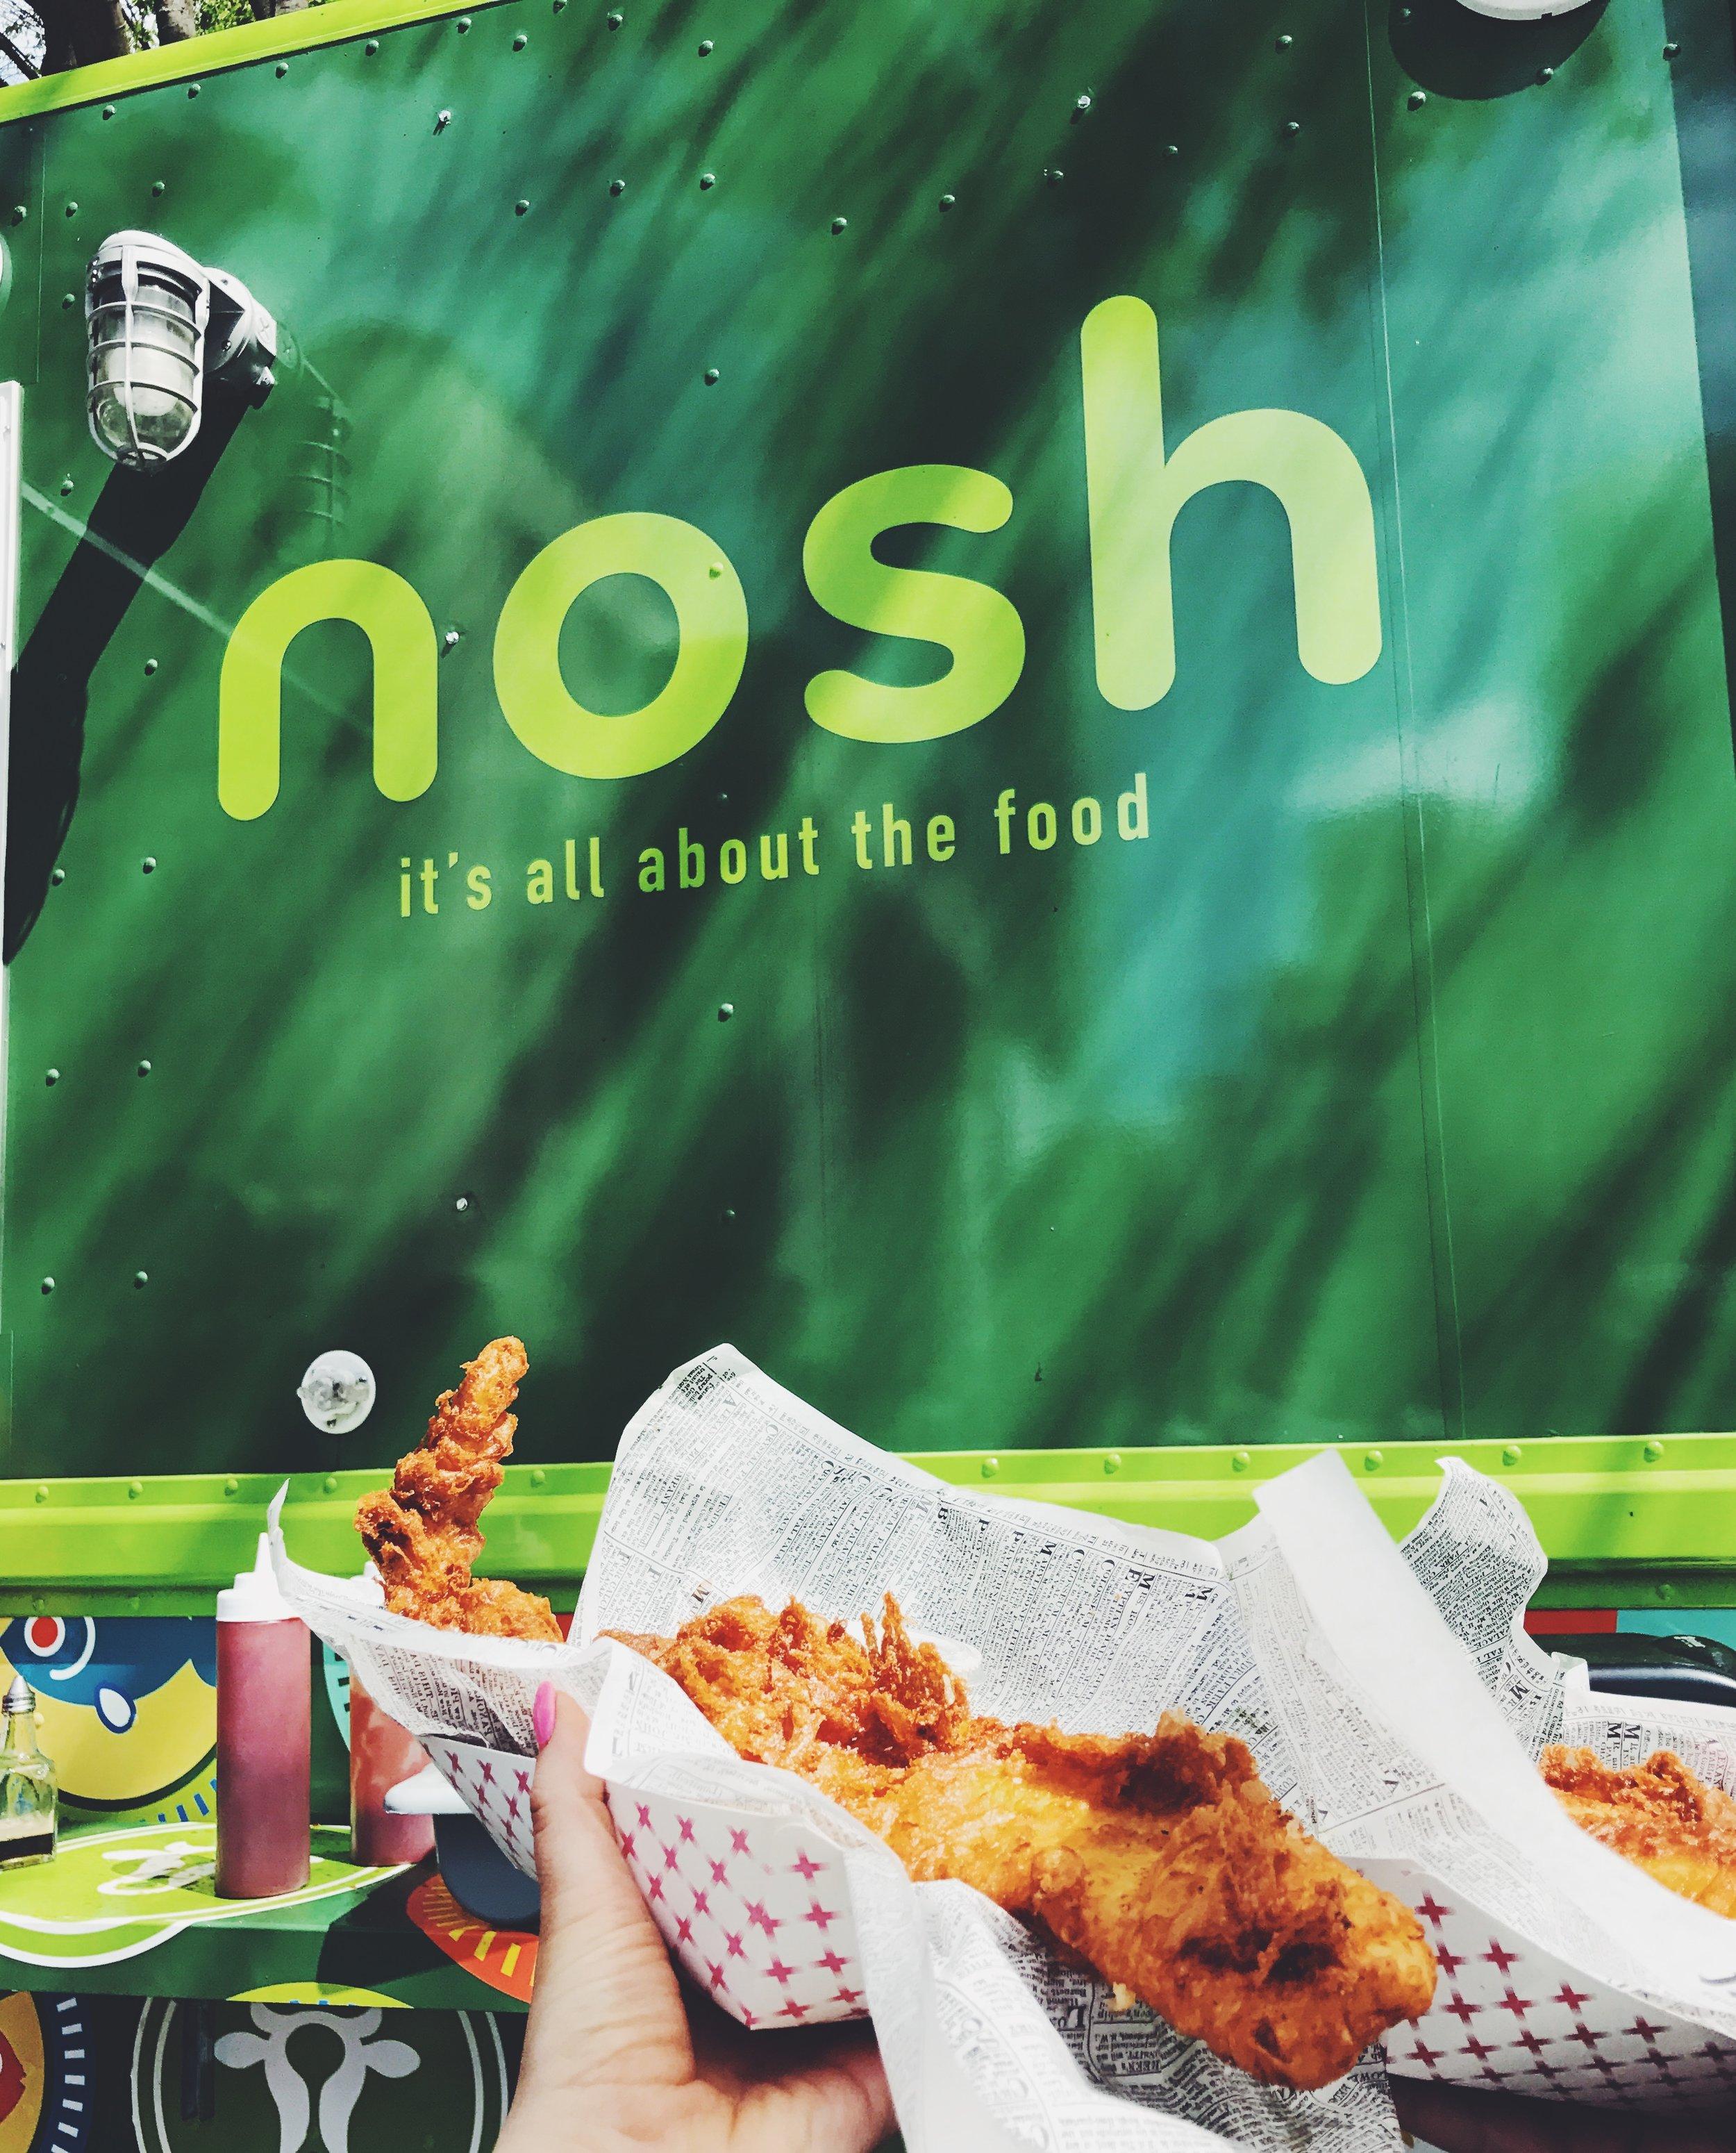 nosh food truck fish & chips